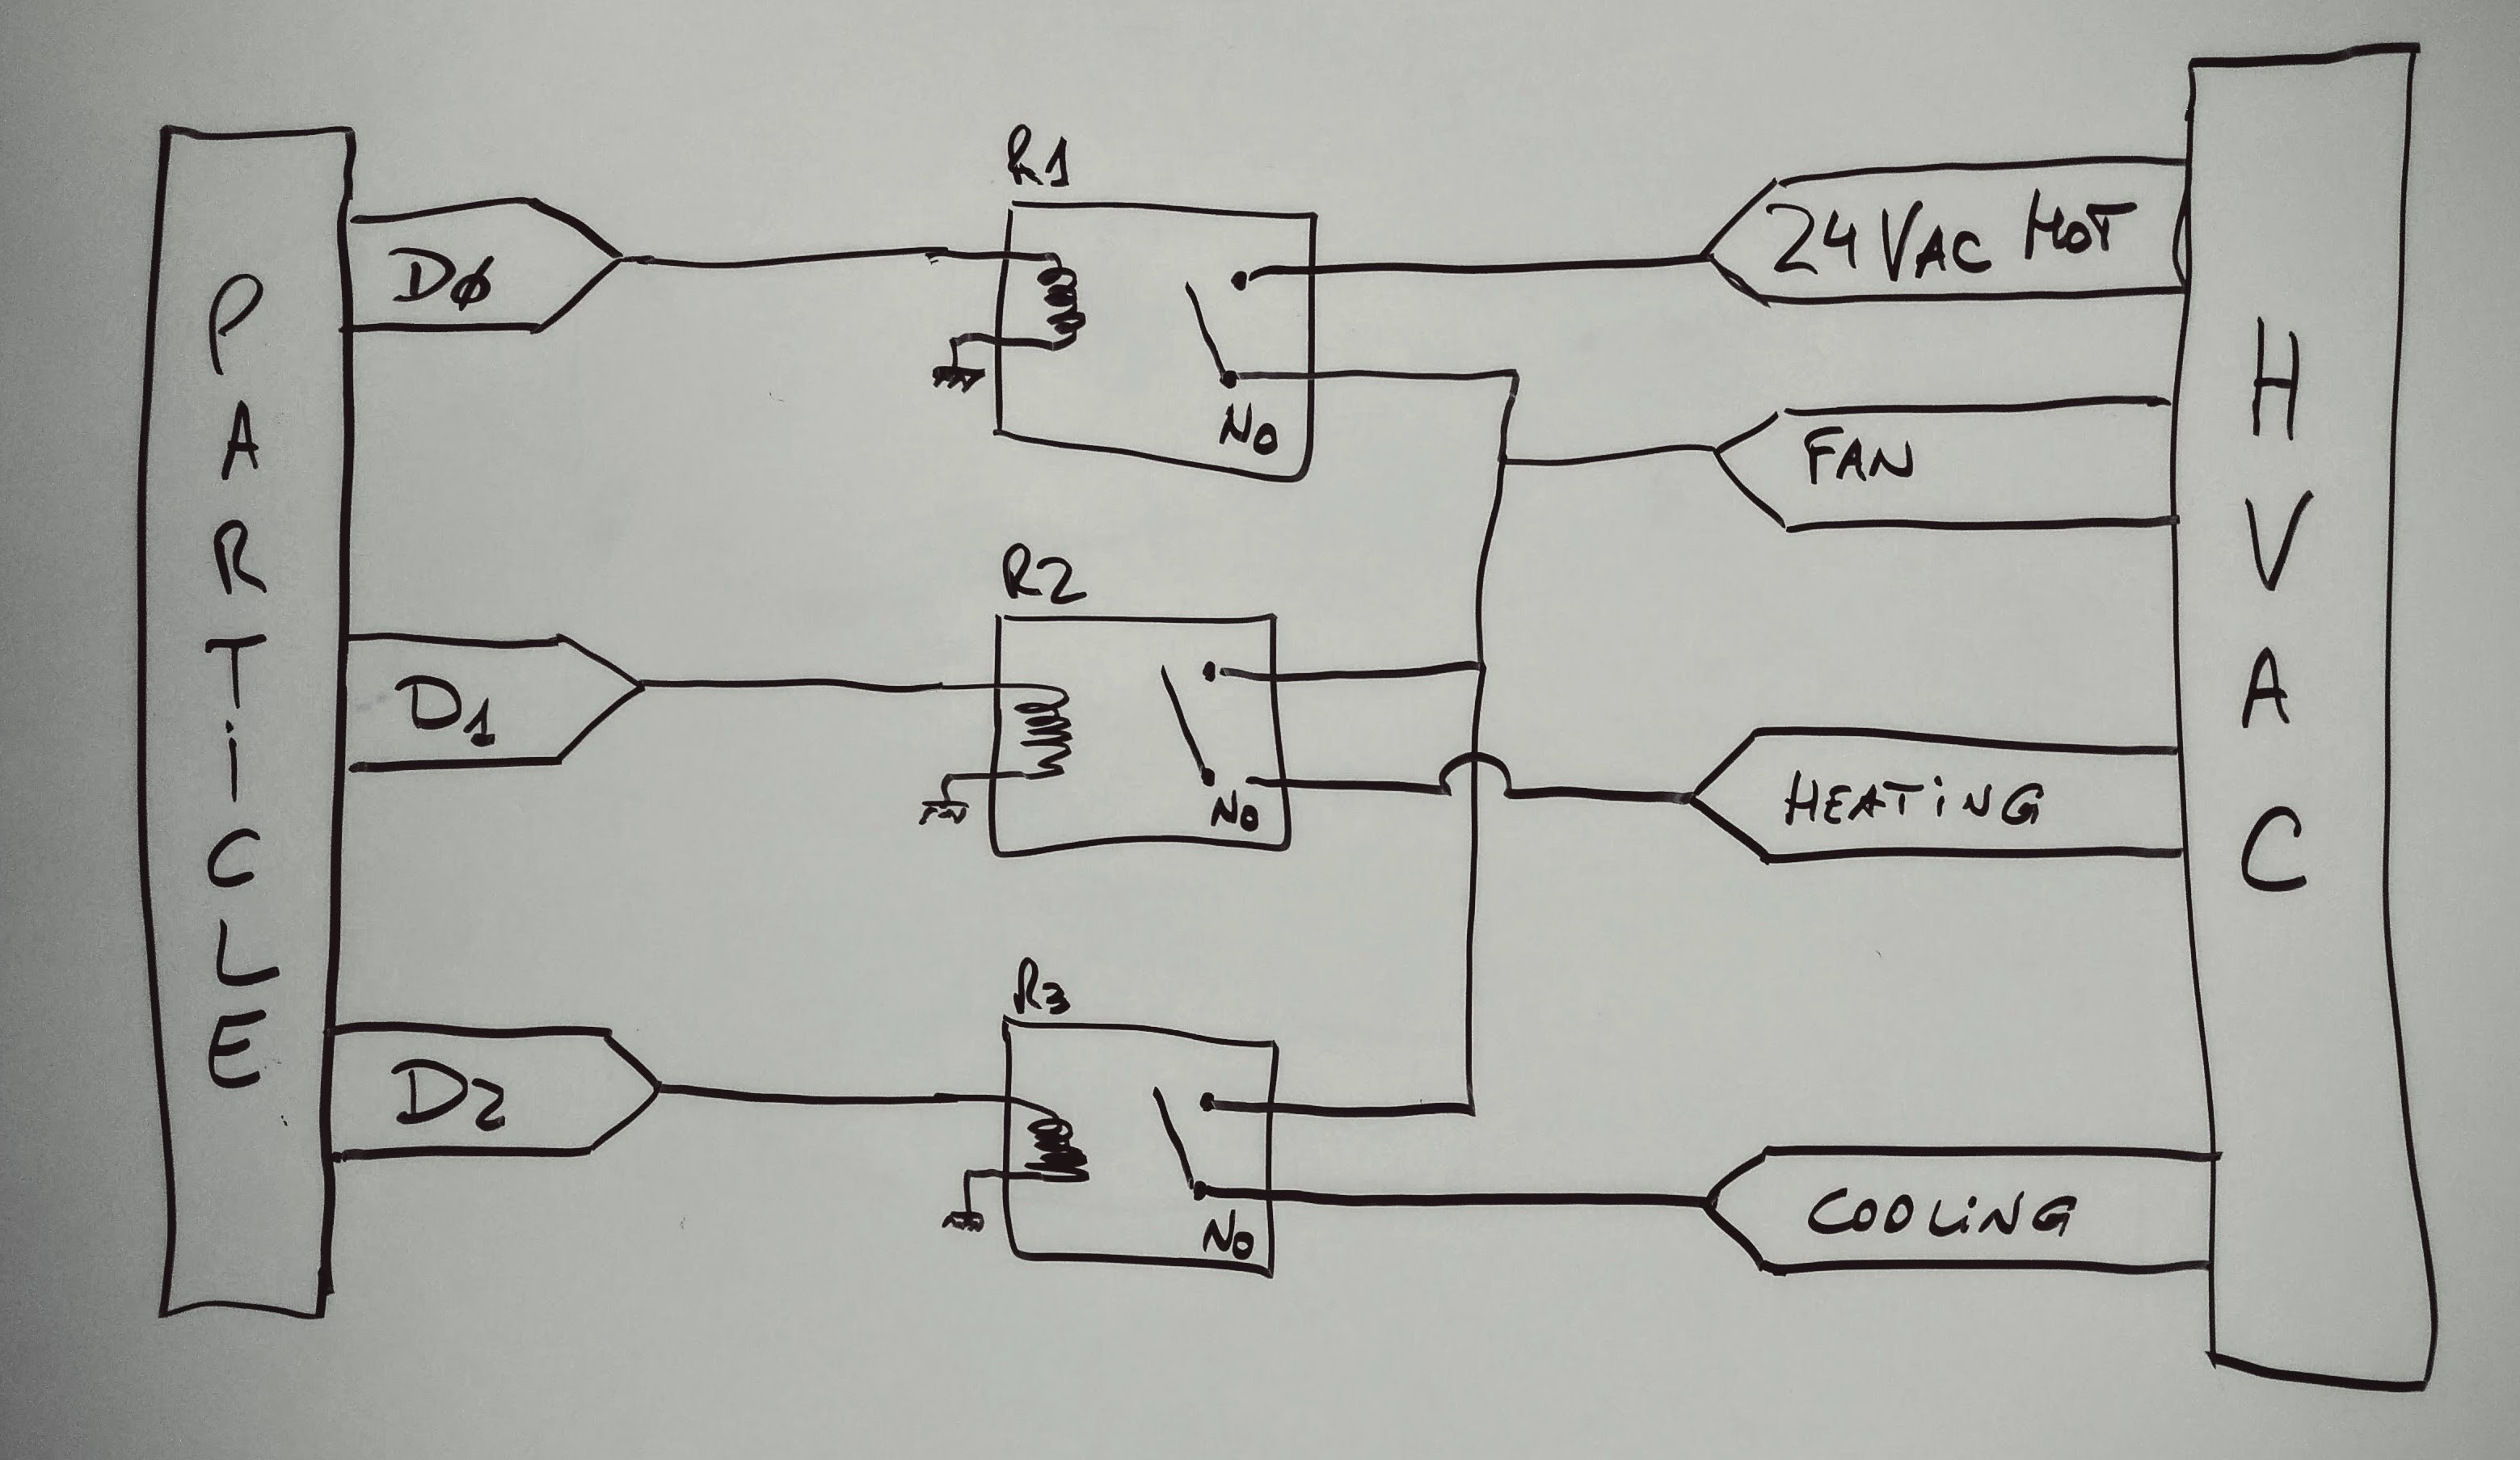 Eagle 160 Wiring Diagram Lincoln Navigator Engine Diagram Aq131 – Leyman Liftgate Wiring Diagram